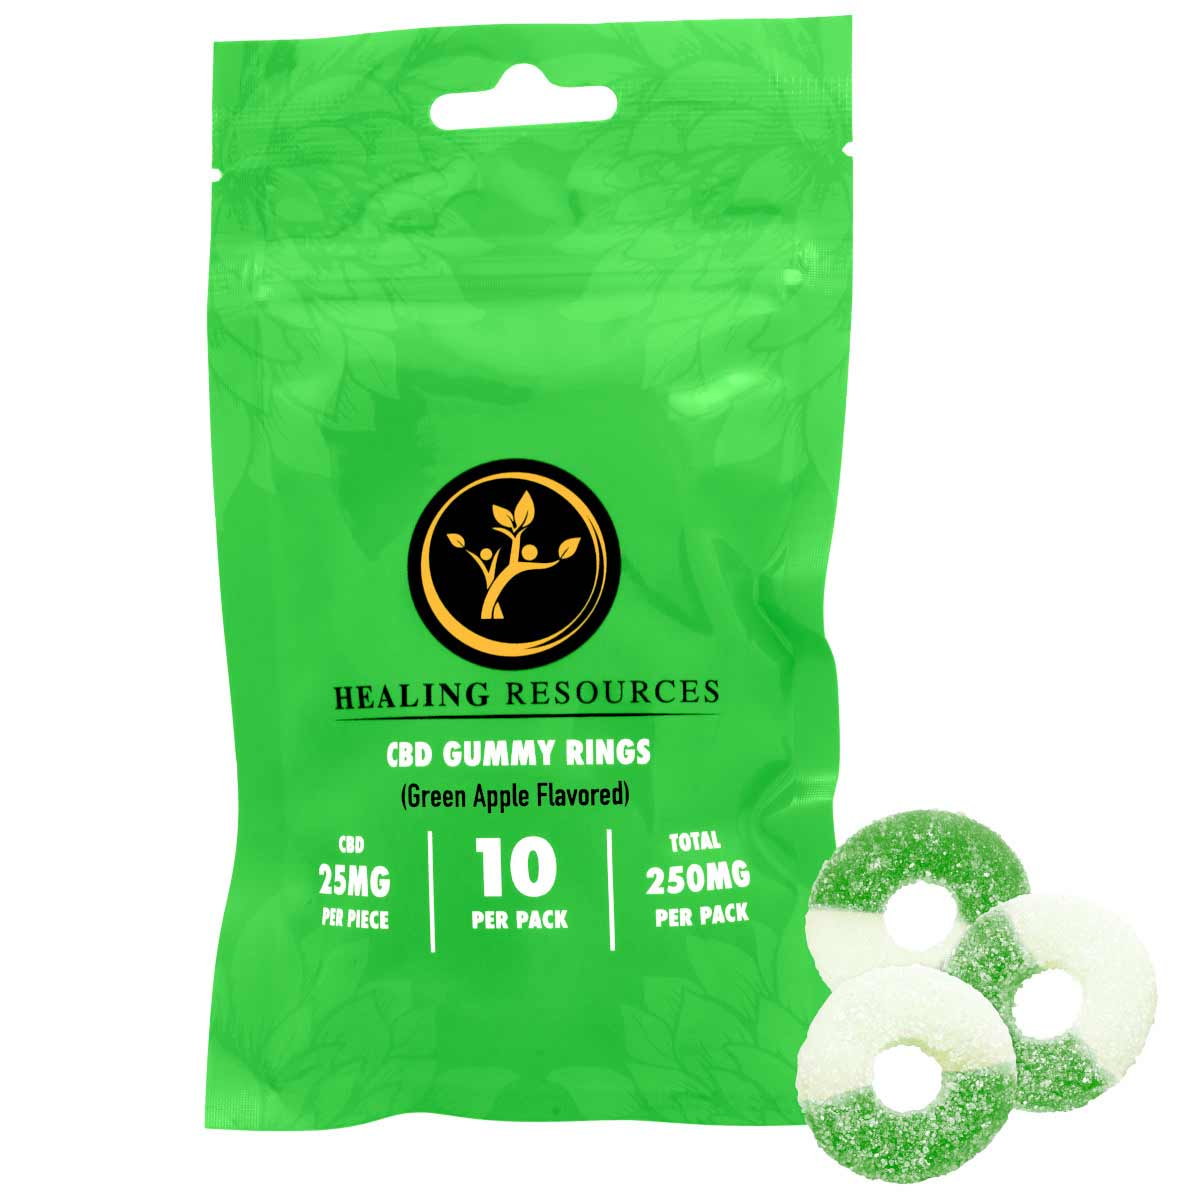 THC Free Gummy Rings